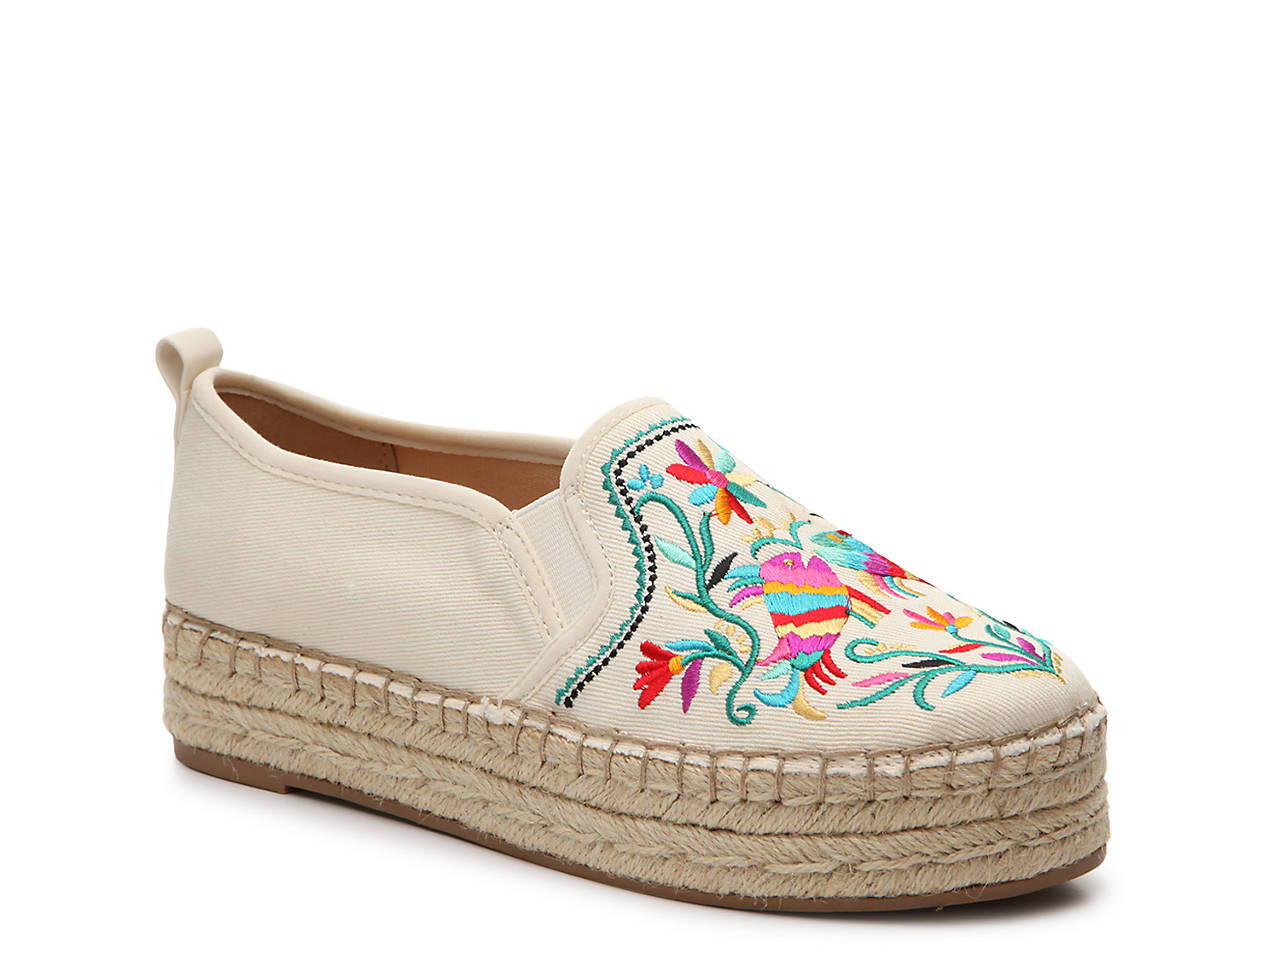 64eaf5213cde Sam Edelman Carrin Espadrille Platform Slip-On Women s Shoes